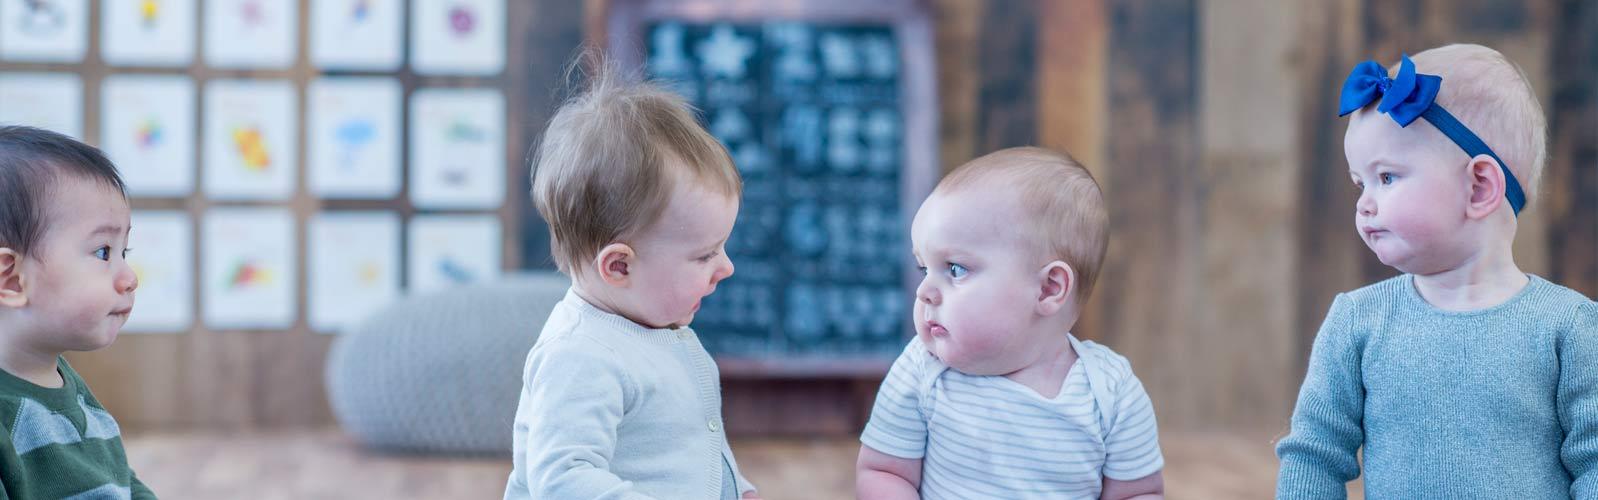 Mississauga Child Care   Brampton Child Care   Toddlers at ...